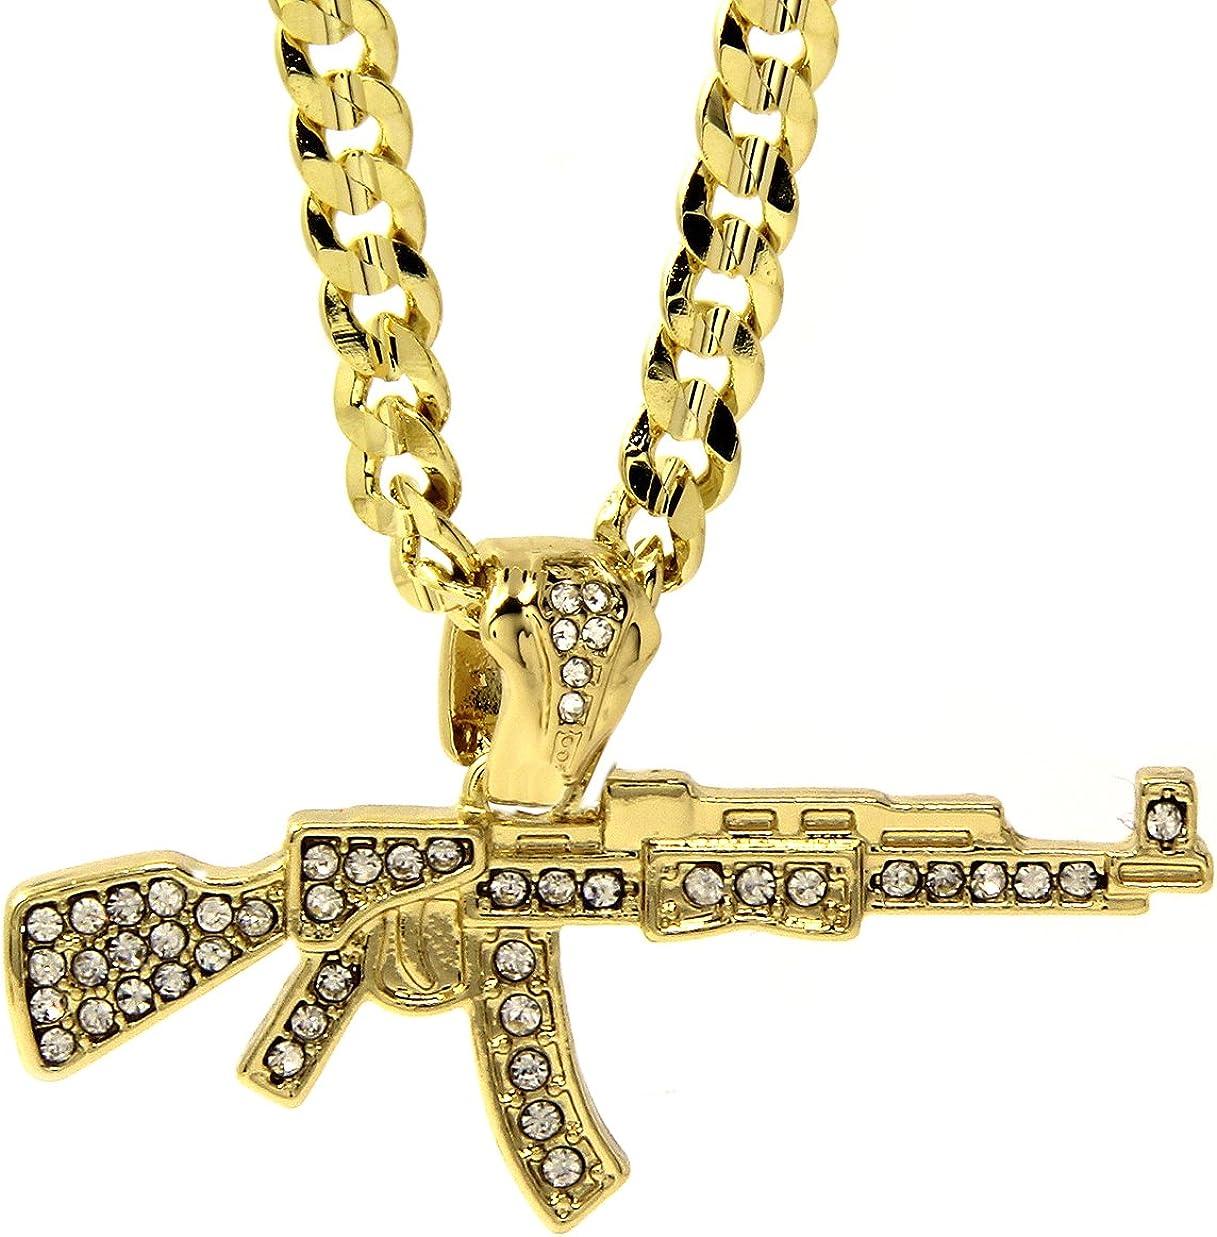 Jewel Town Mens 14k Gold Plated Iced Cz Hip-Hop AK-47 Gun Pendant 24